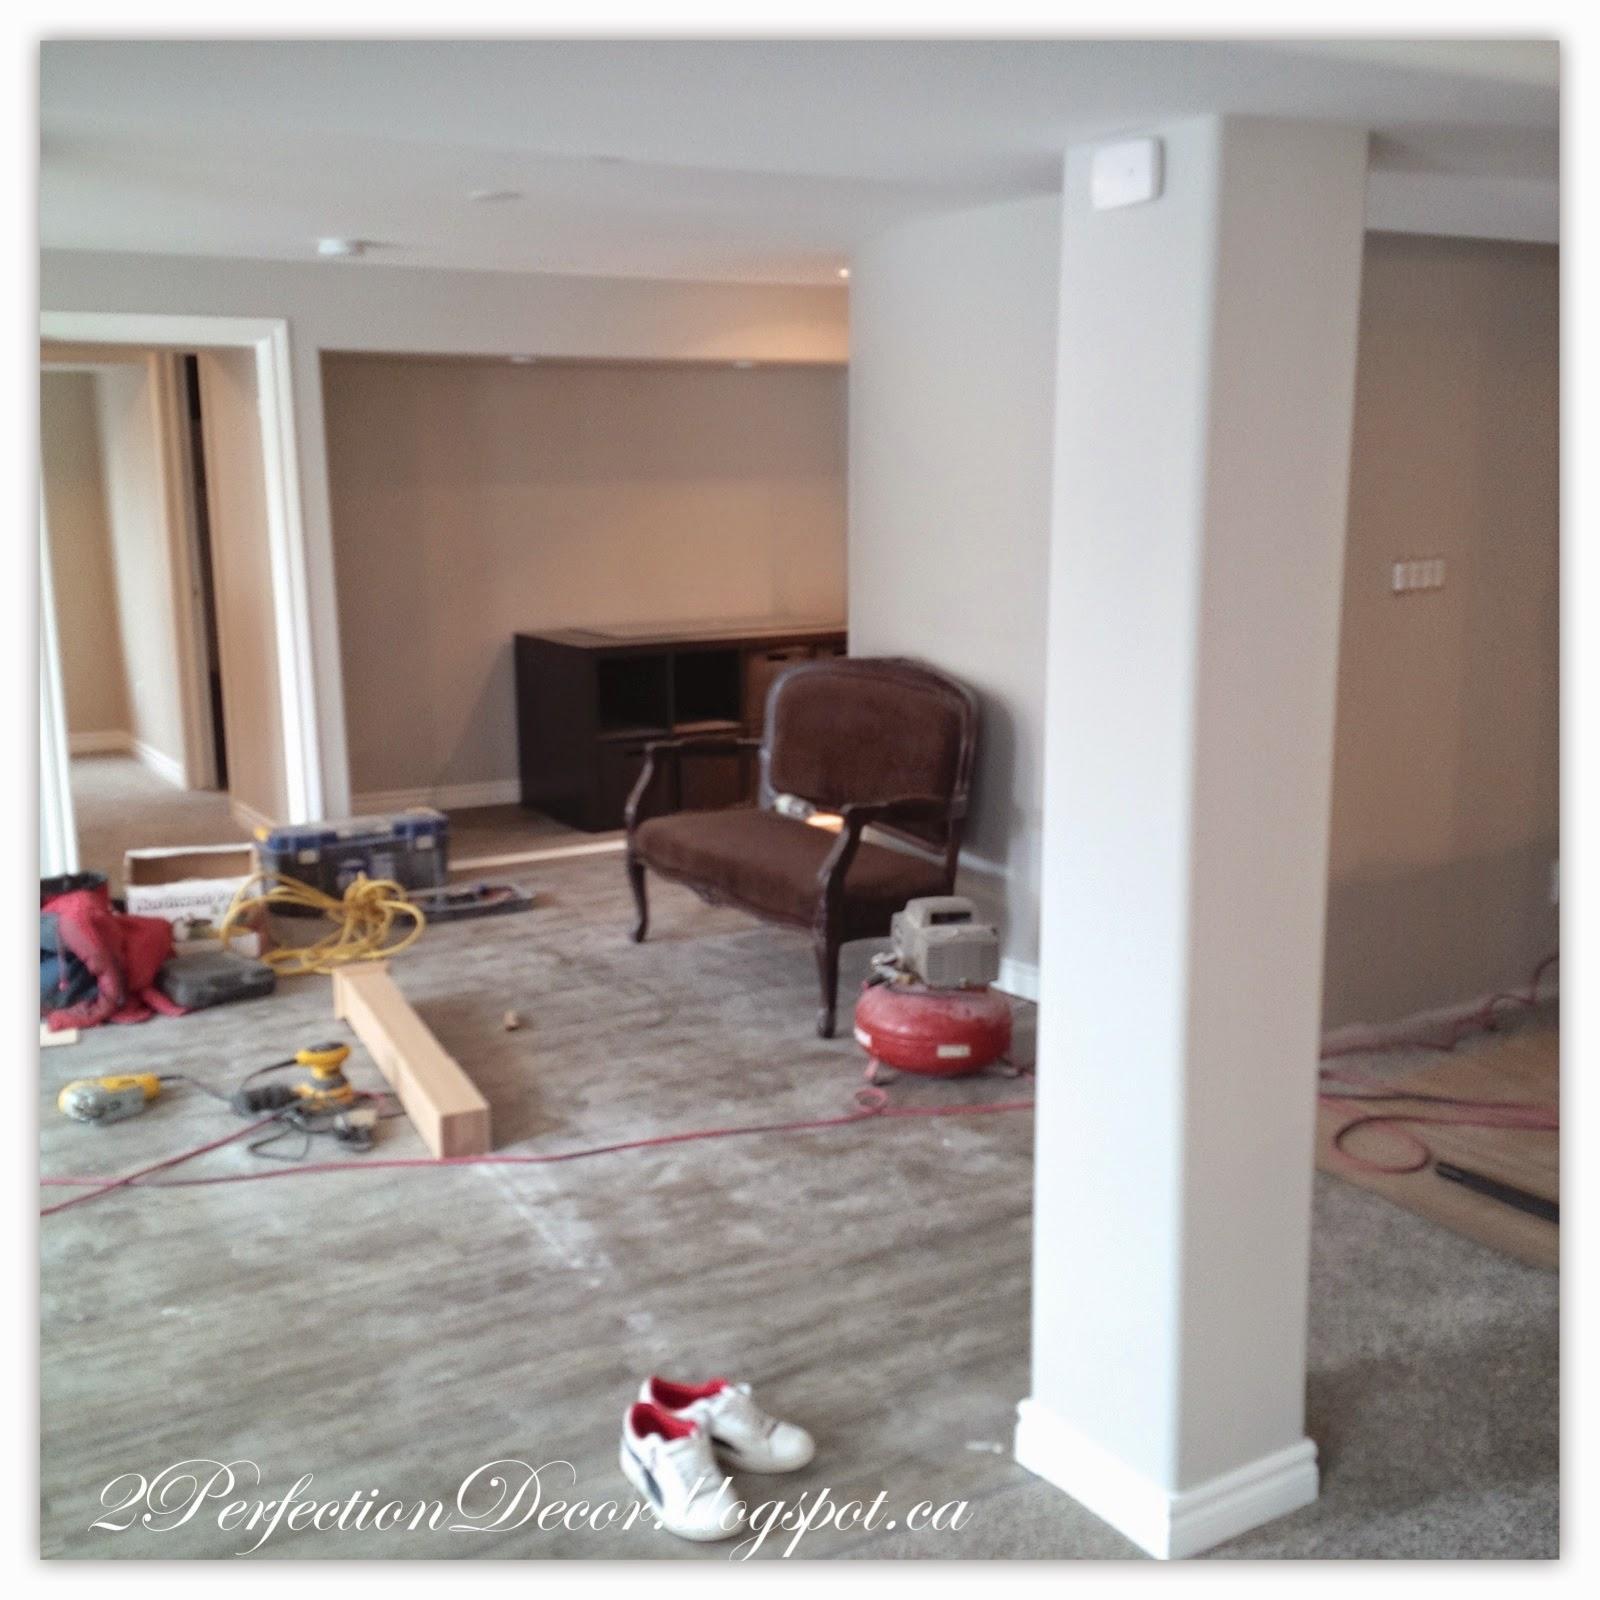 2Perfection Decor Basement Flooring Gets Installed